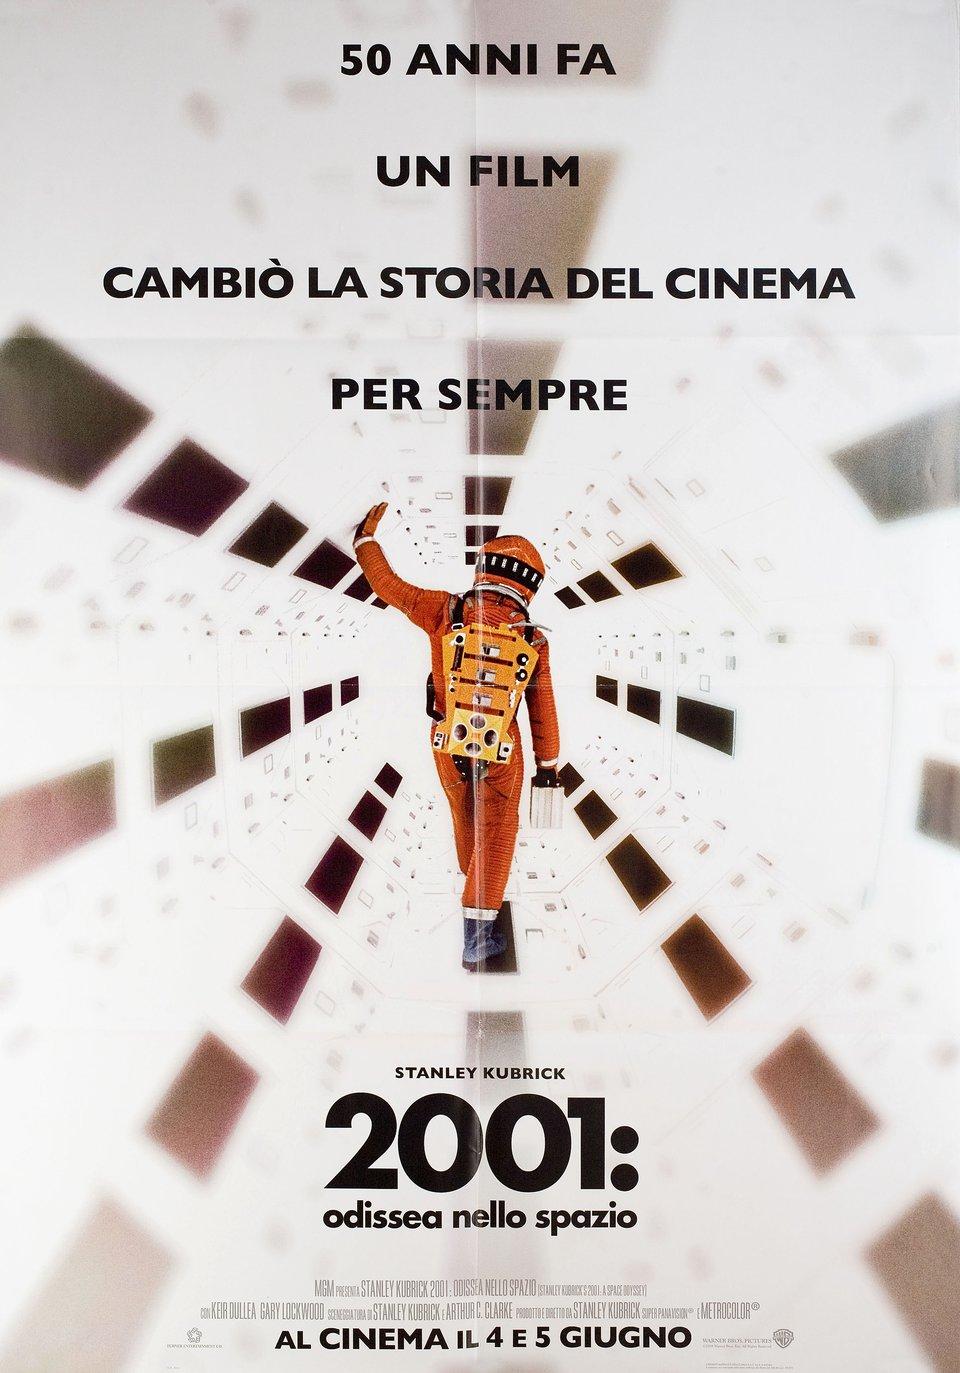 2001: A Space Odyssey R2018 Italian Due Fogli Poster